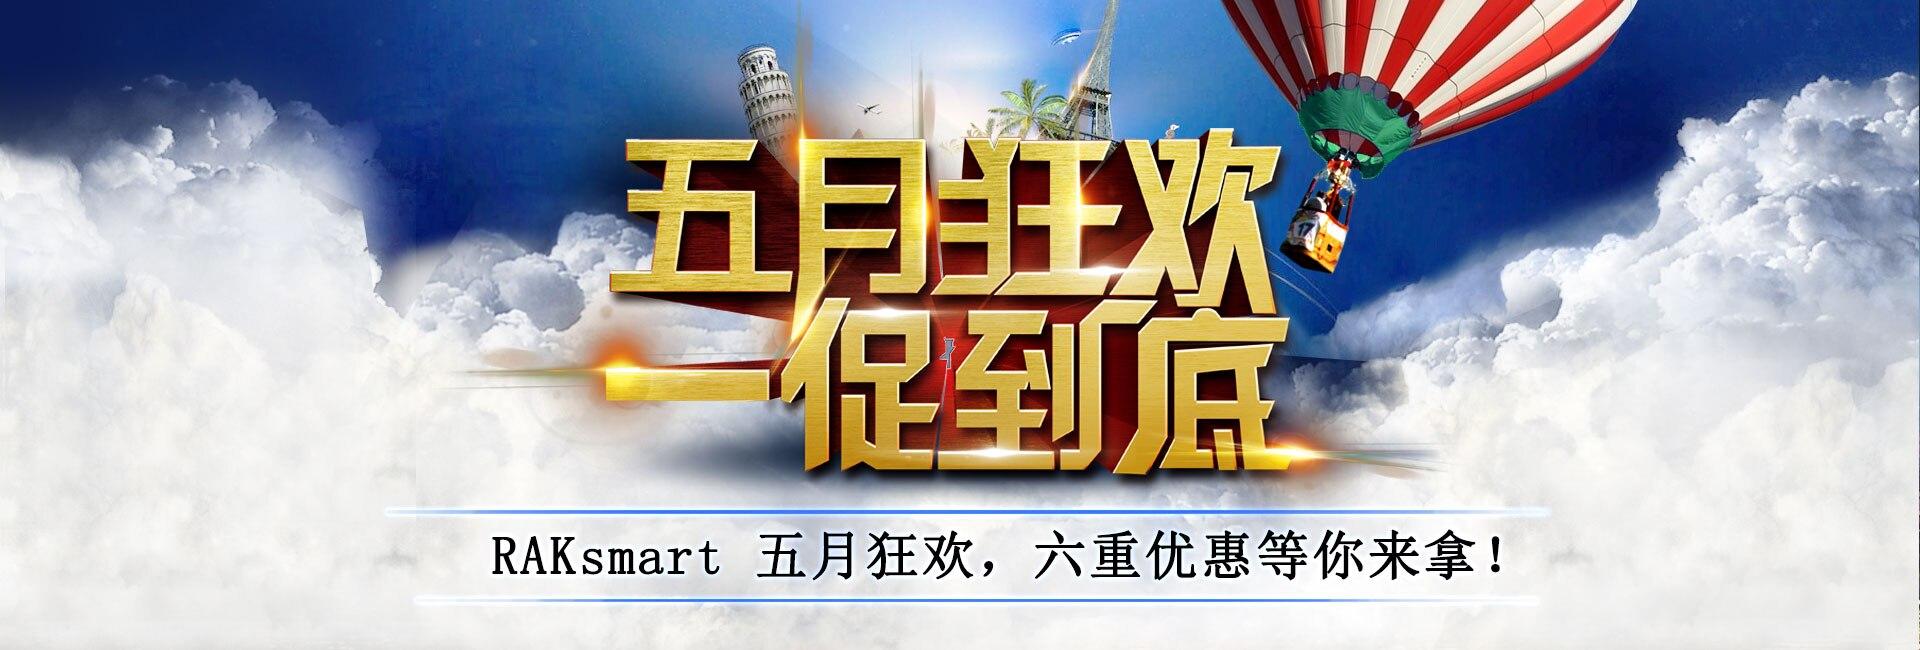 RAKsmart 五月活动: 美国VPS续购八折 / 香港独服半价七折